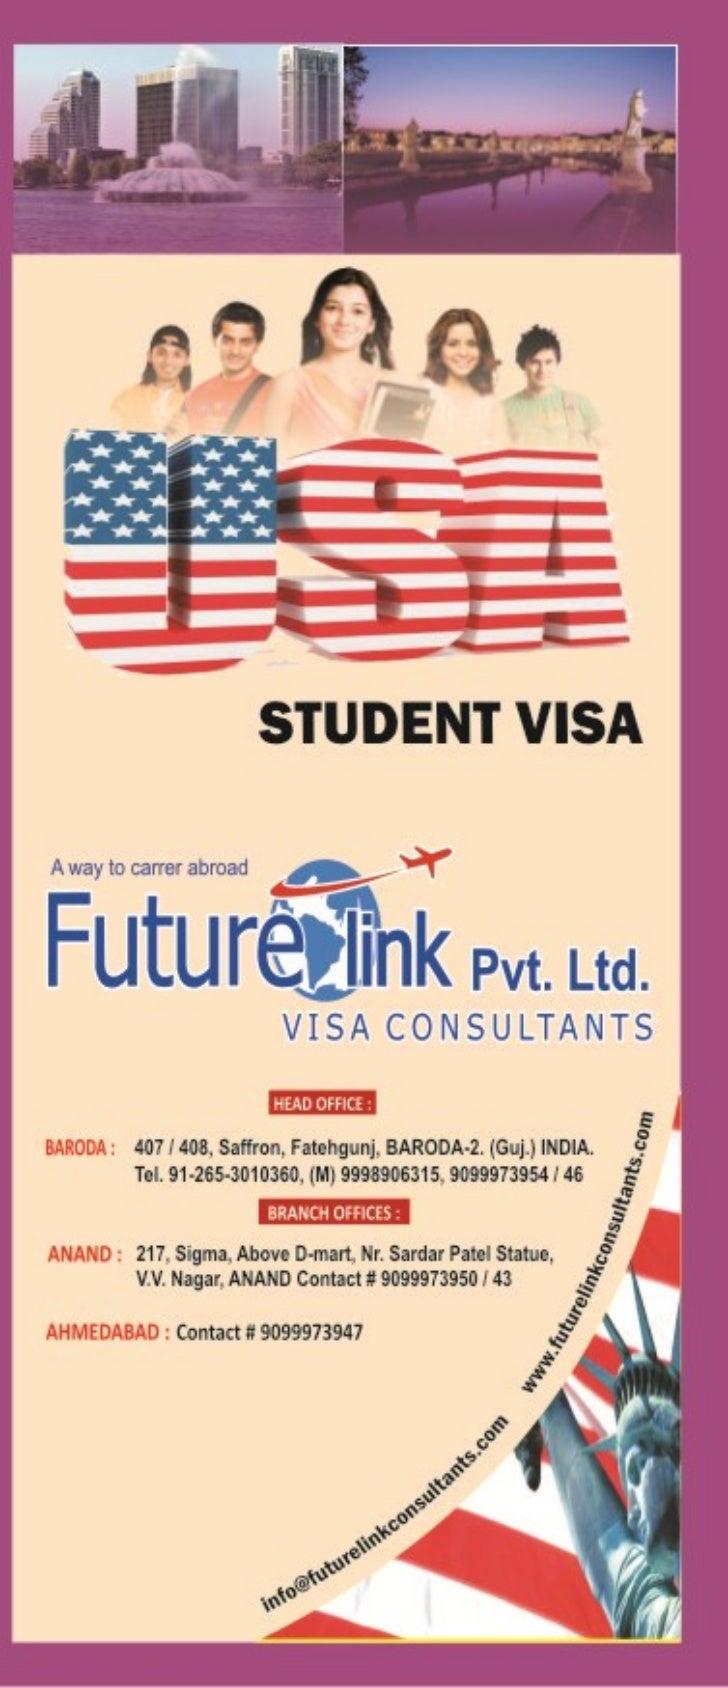 Study in USA, Work in USA, Study Visa USA, Visitor Visa USA, USA Student Visa at http://www.futurelinkconsultants.com/